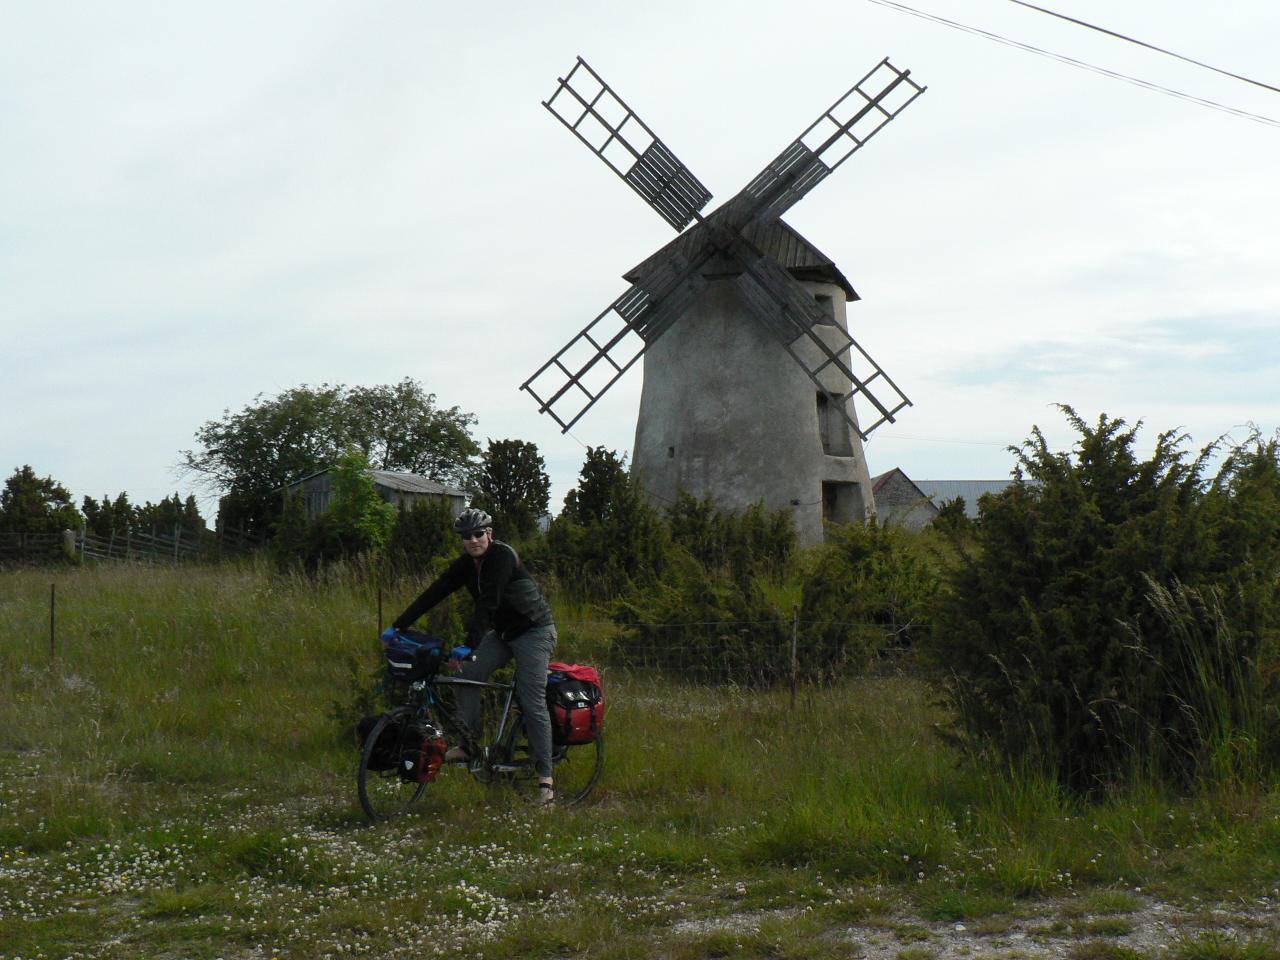 midsommar2010_Gotland